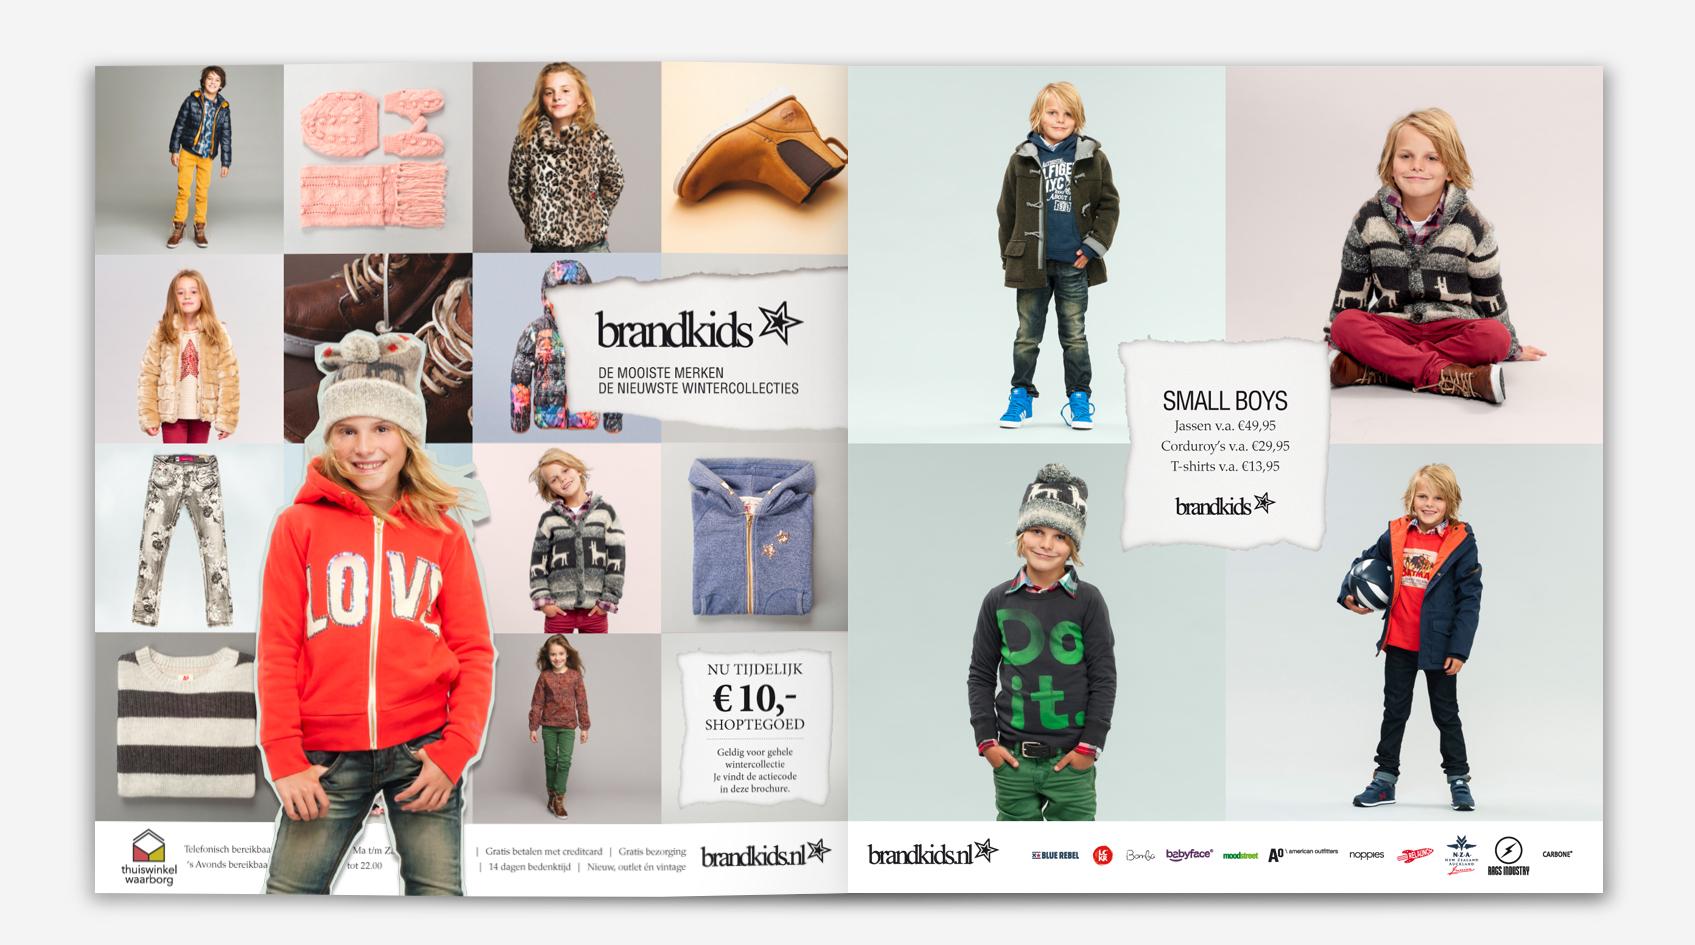 rene_koster_brandkids_magazine_04.jpg